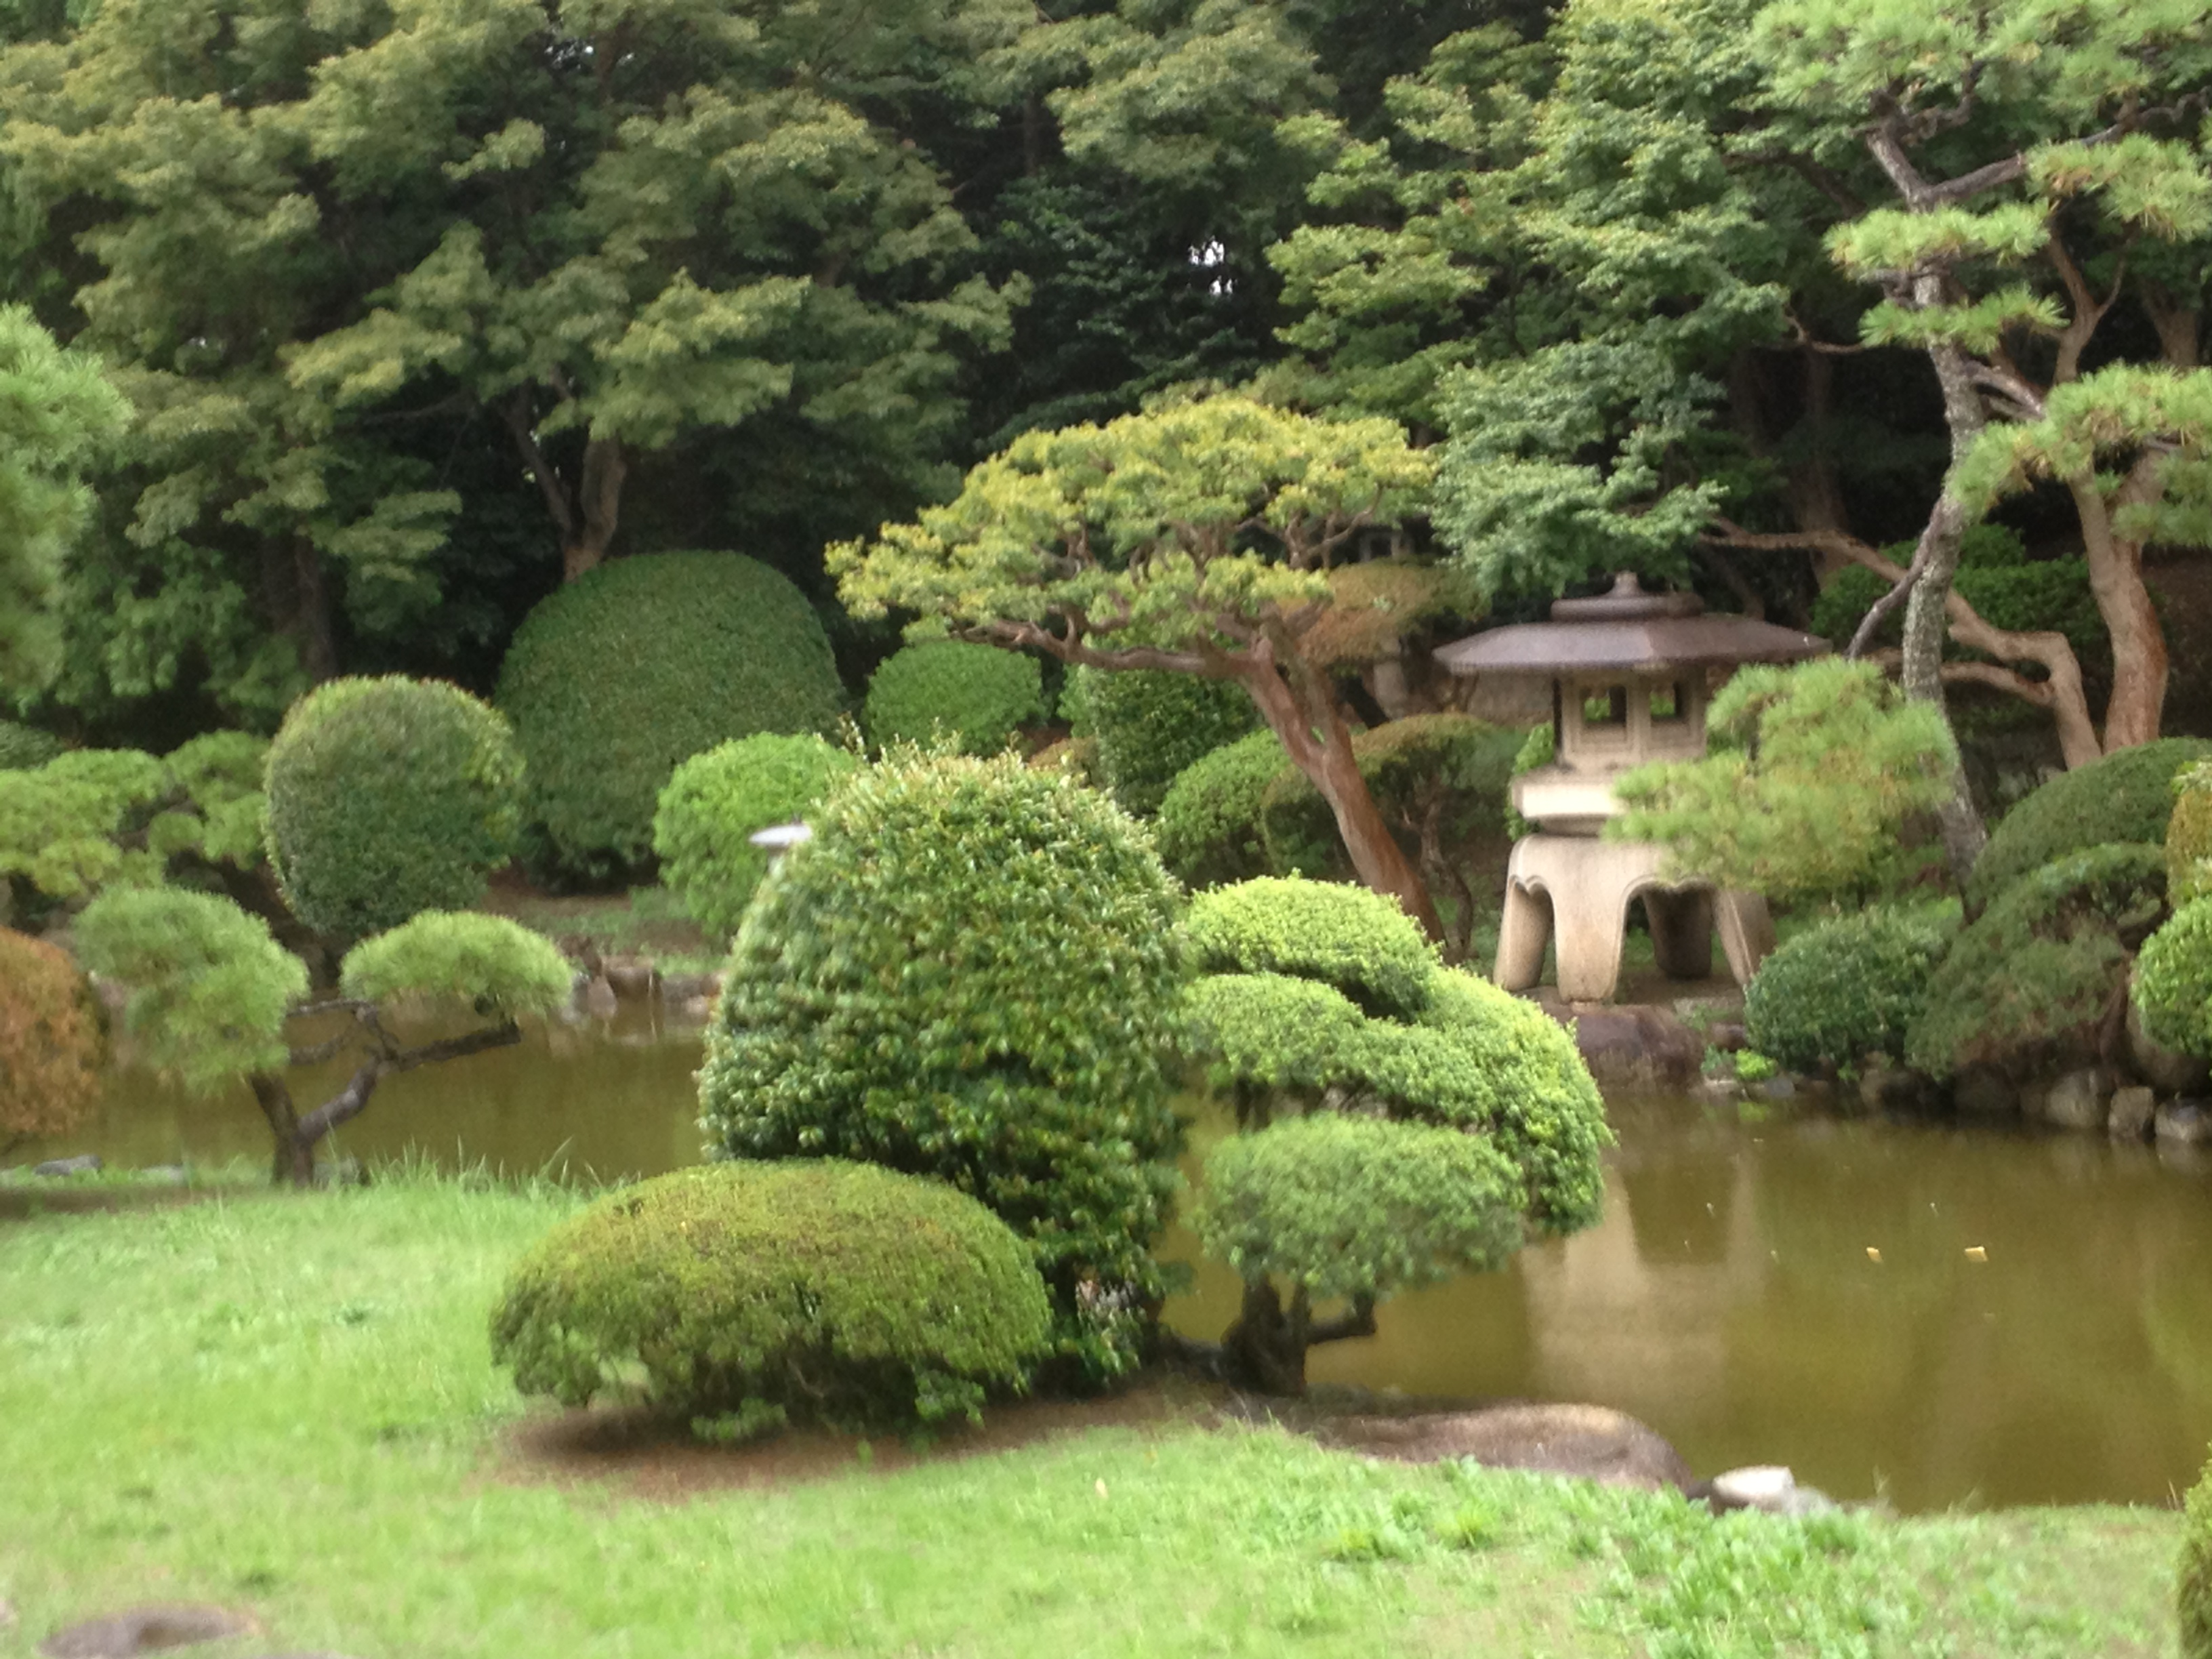 Giardino Zen Berlino : Come allestire un giardino zen